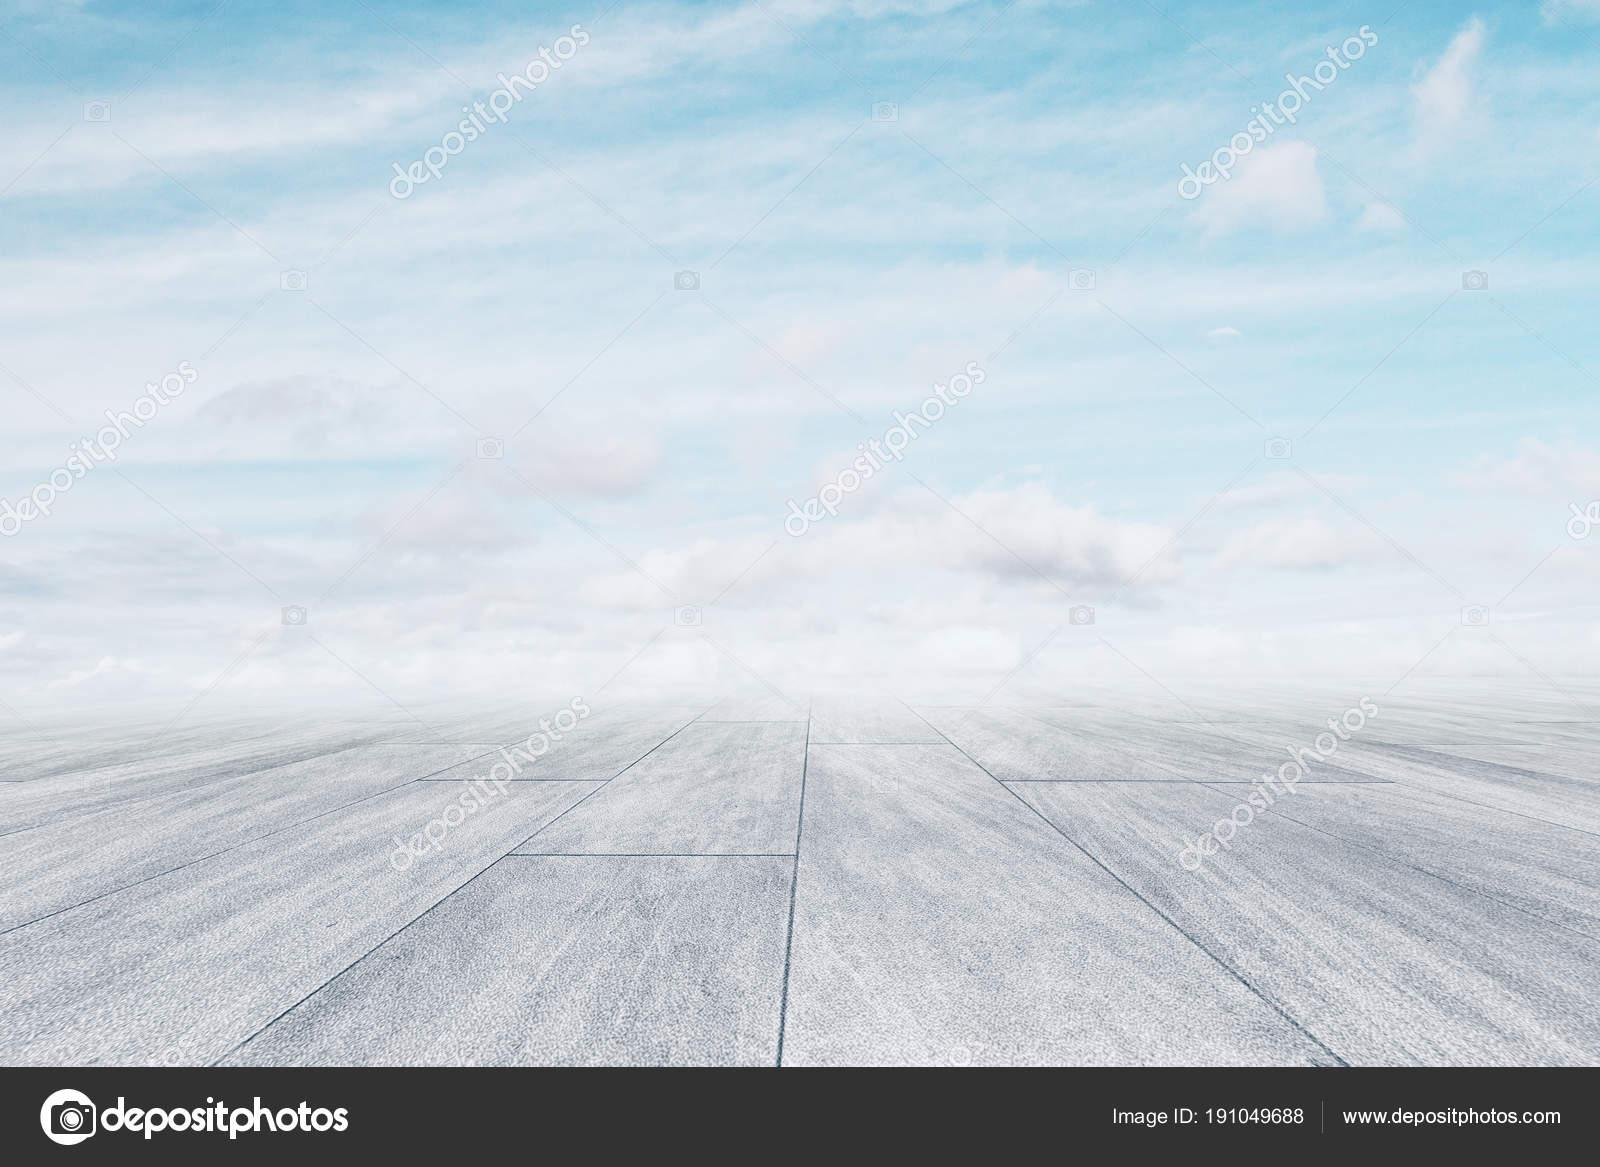 creative sky and ground background stock photo peshkov 191049688